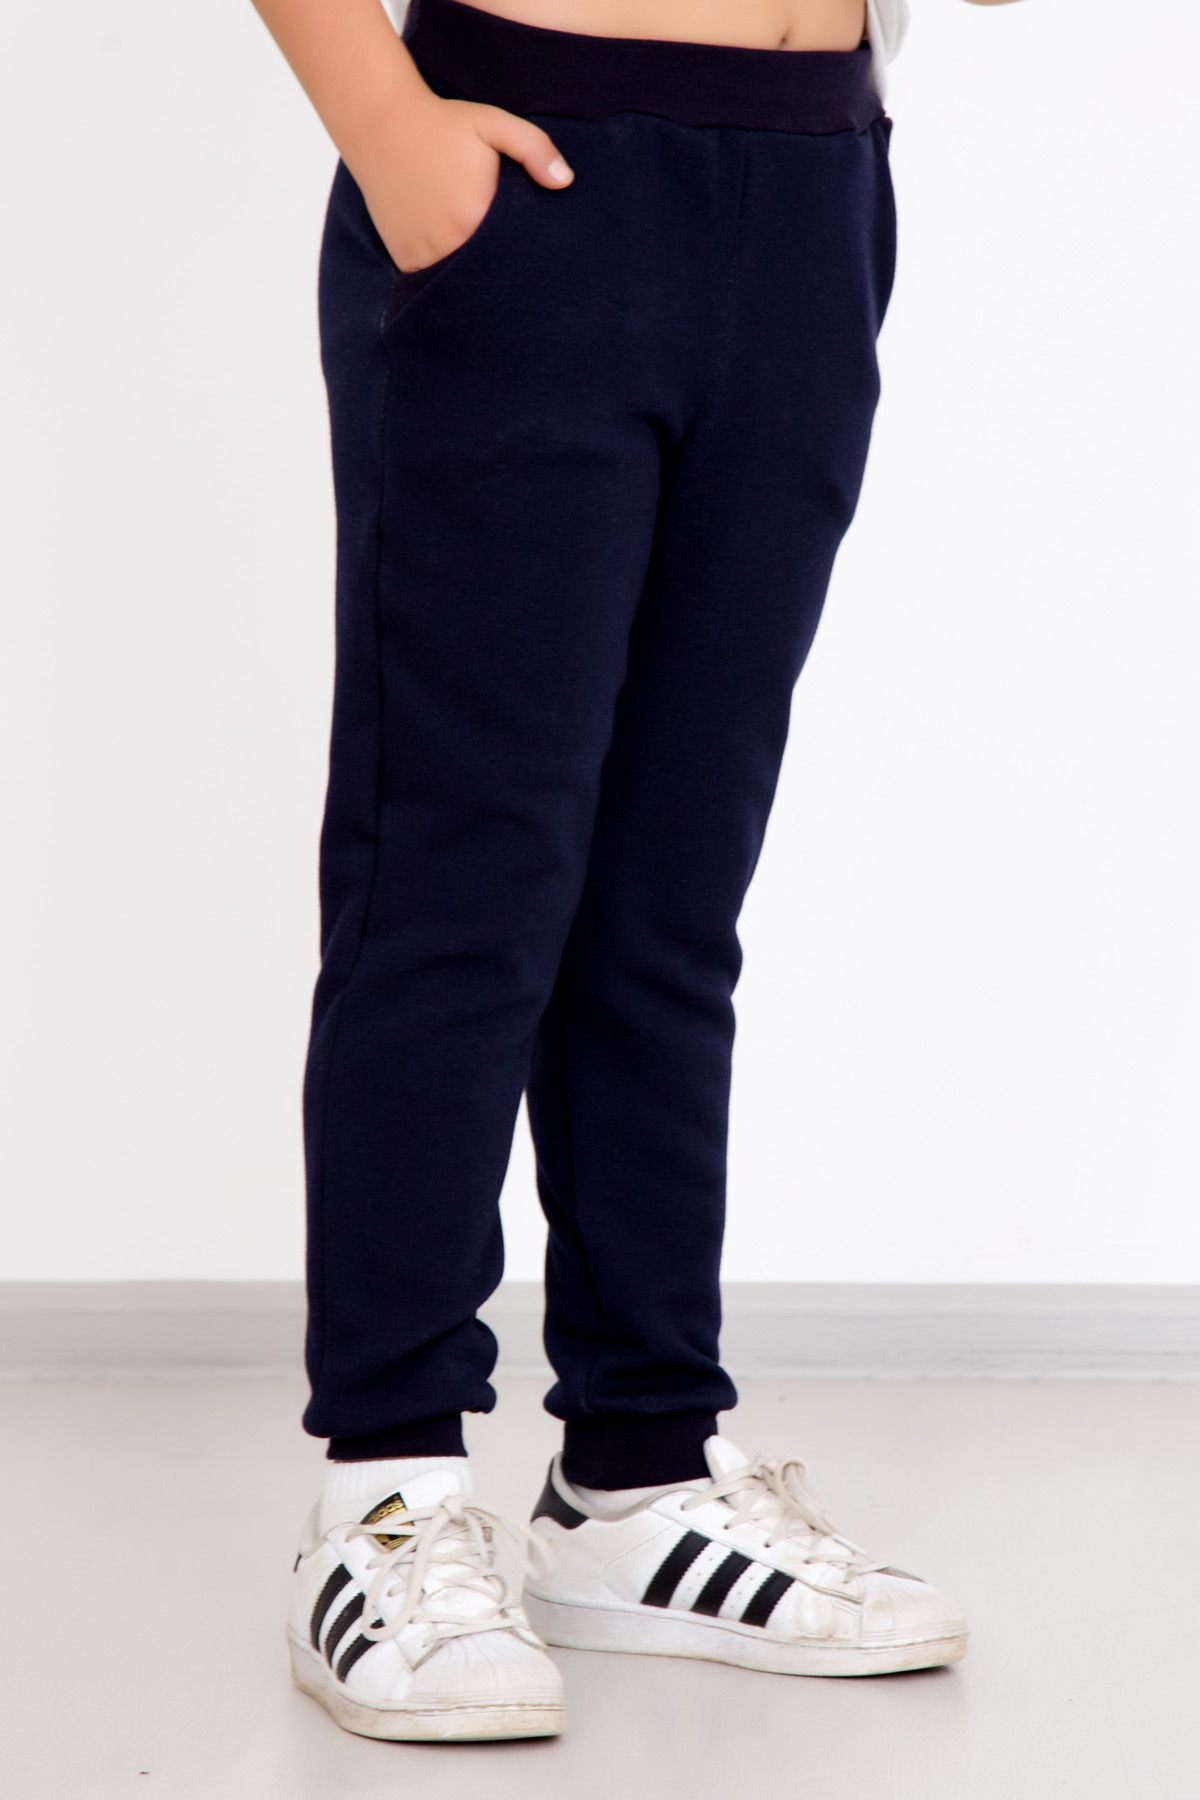 Дет. брюки Спринт р. 32Брюки<br><br><br>Тип: Дет. брюки<br>Размер: 32<br>Материал: Интерсофт